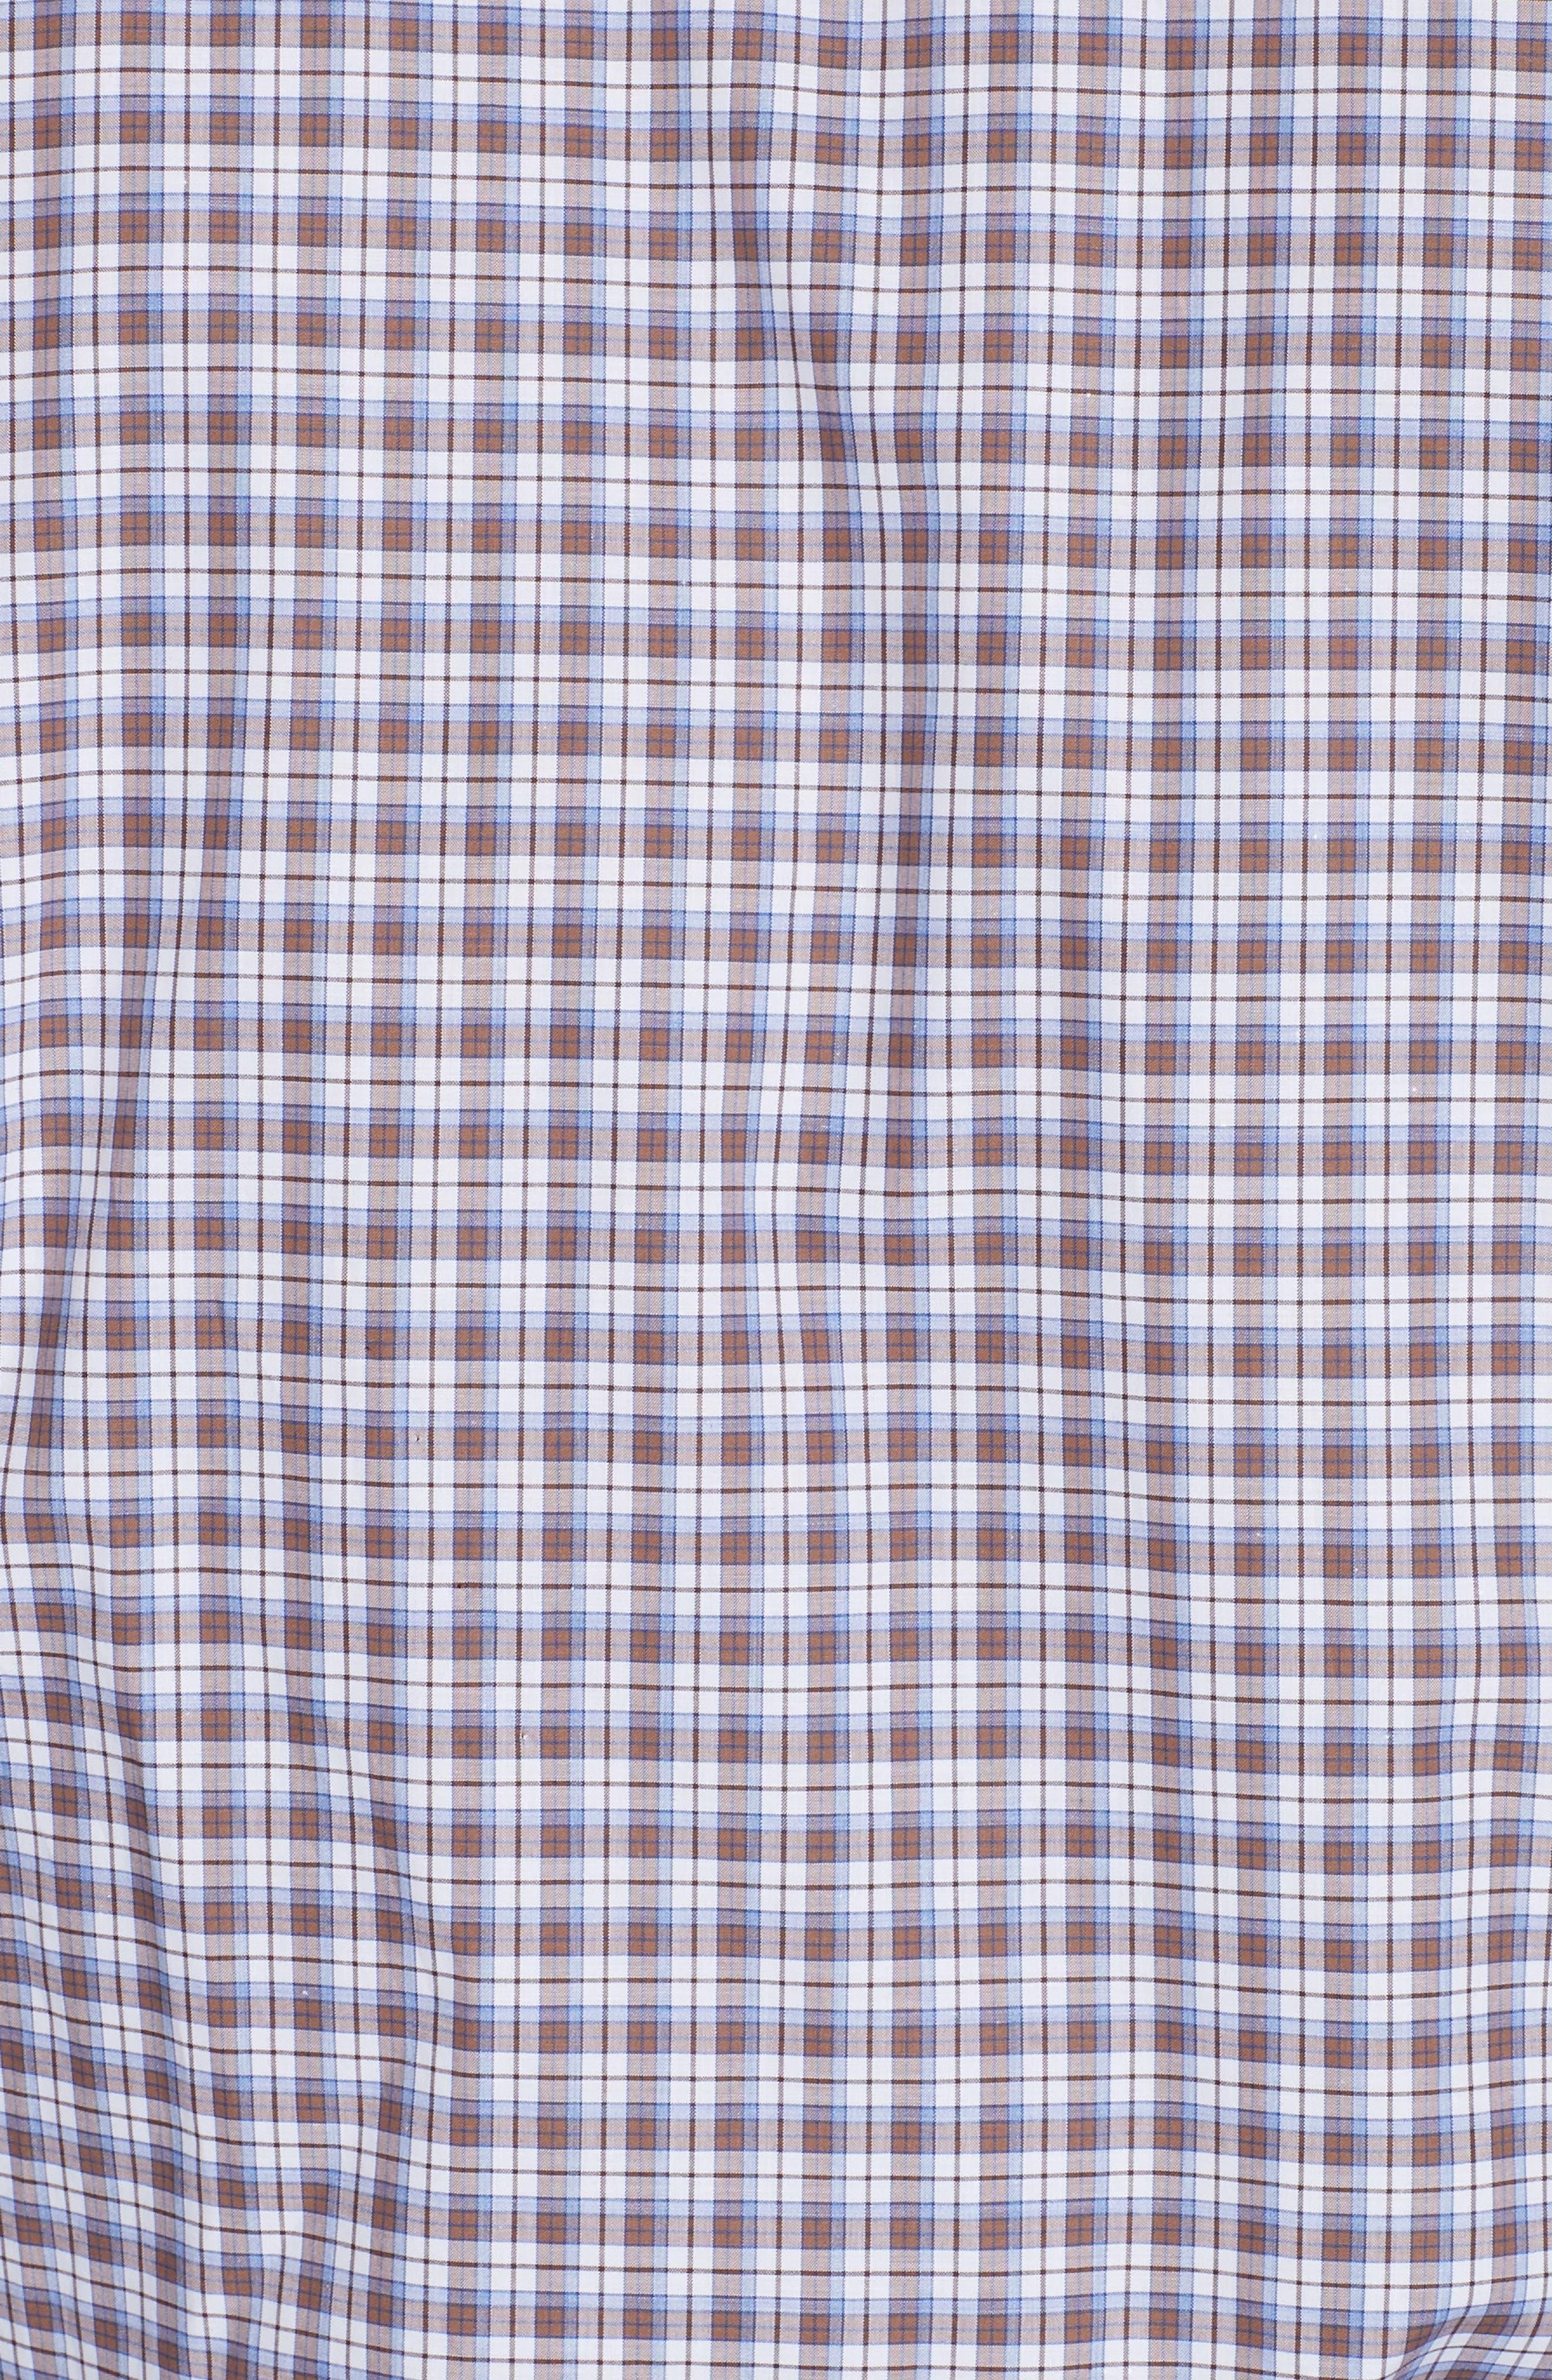 Trim Fit Plaid Dress Shirt,                             Alternate thumbnail 5, color,                             MED BROWN